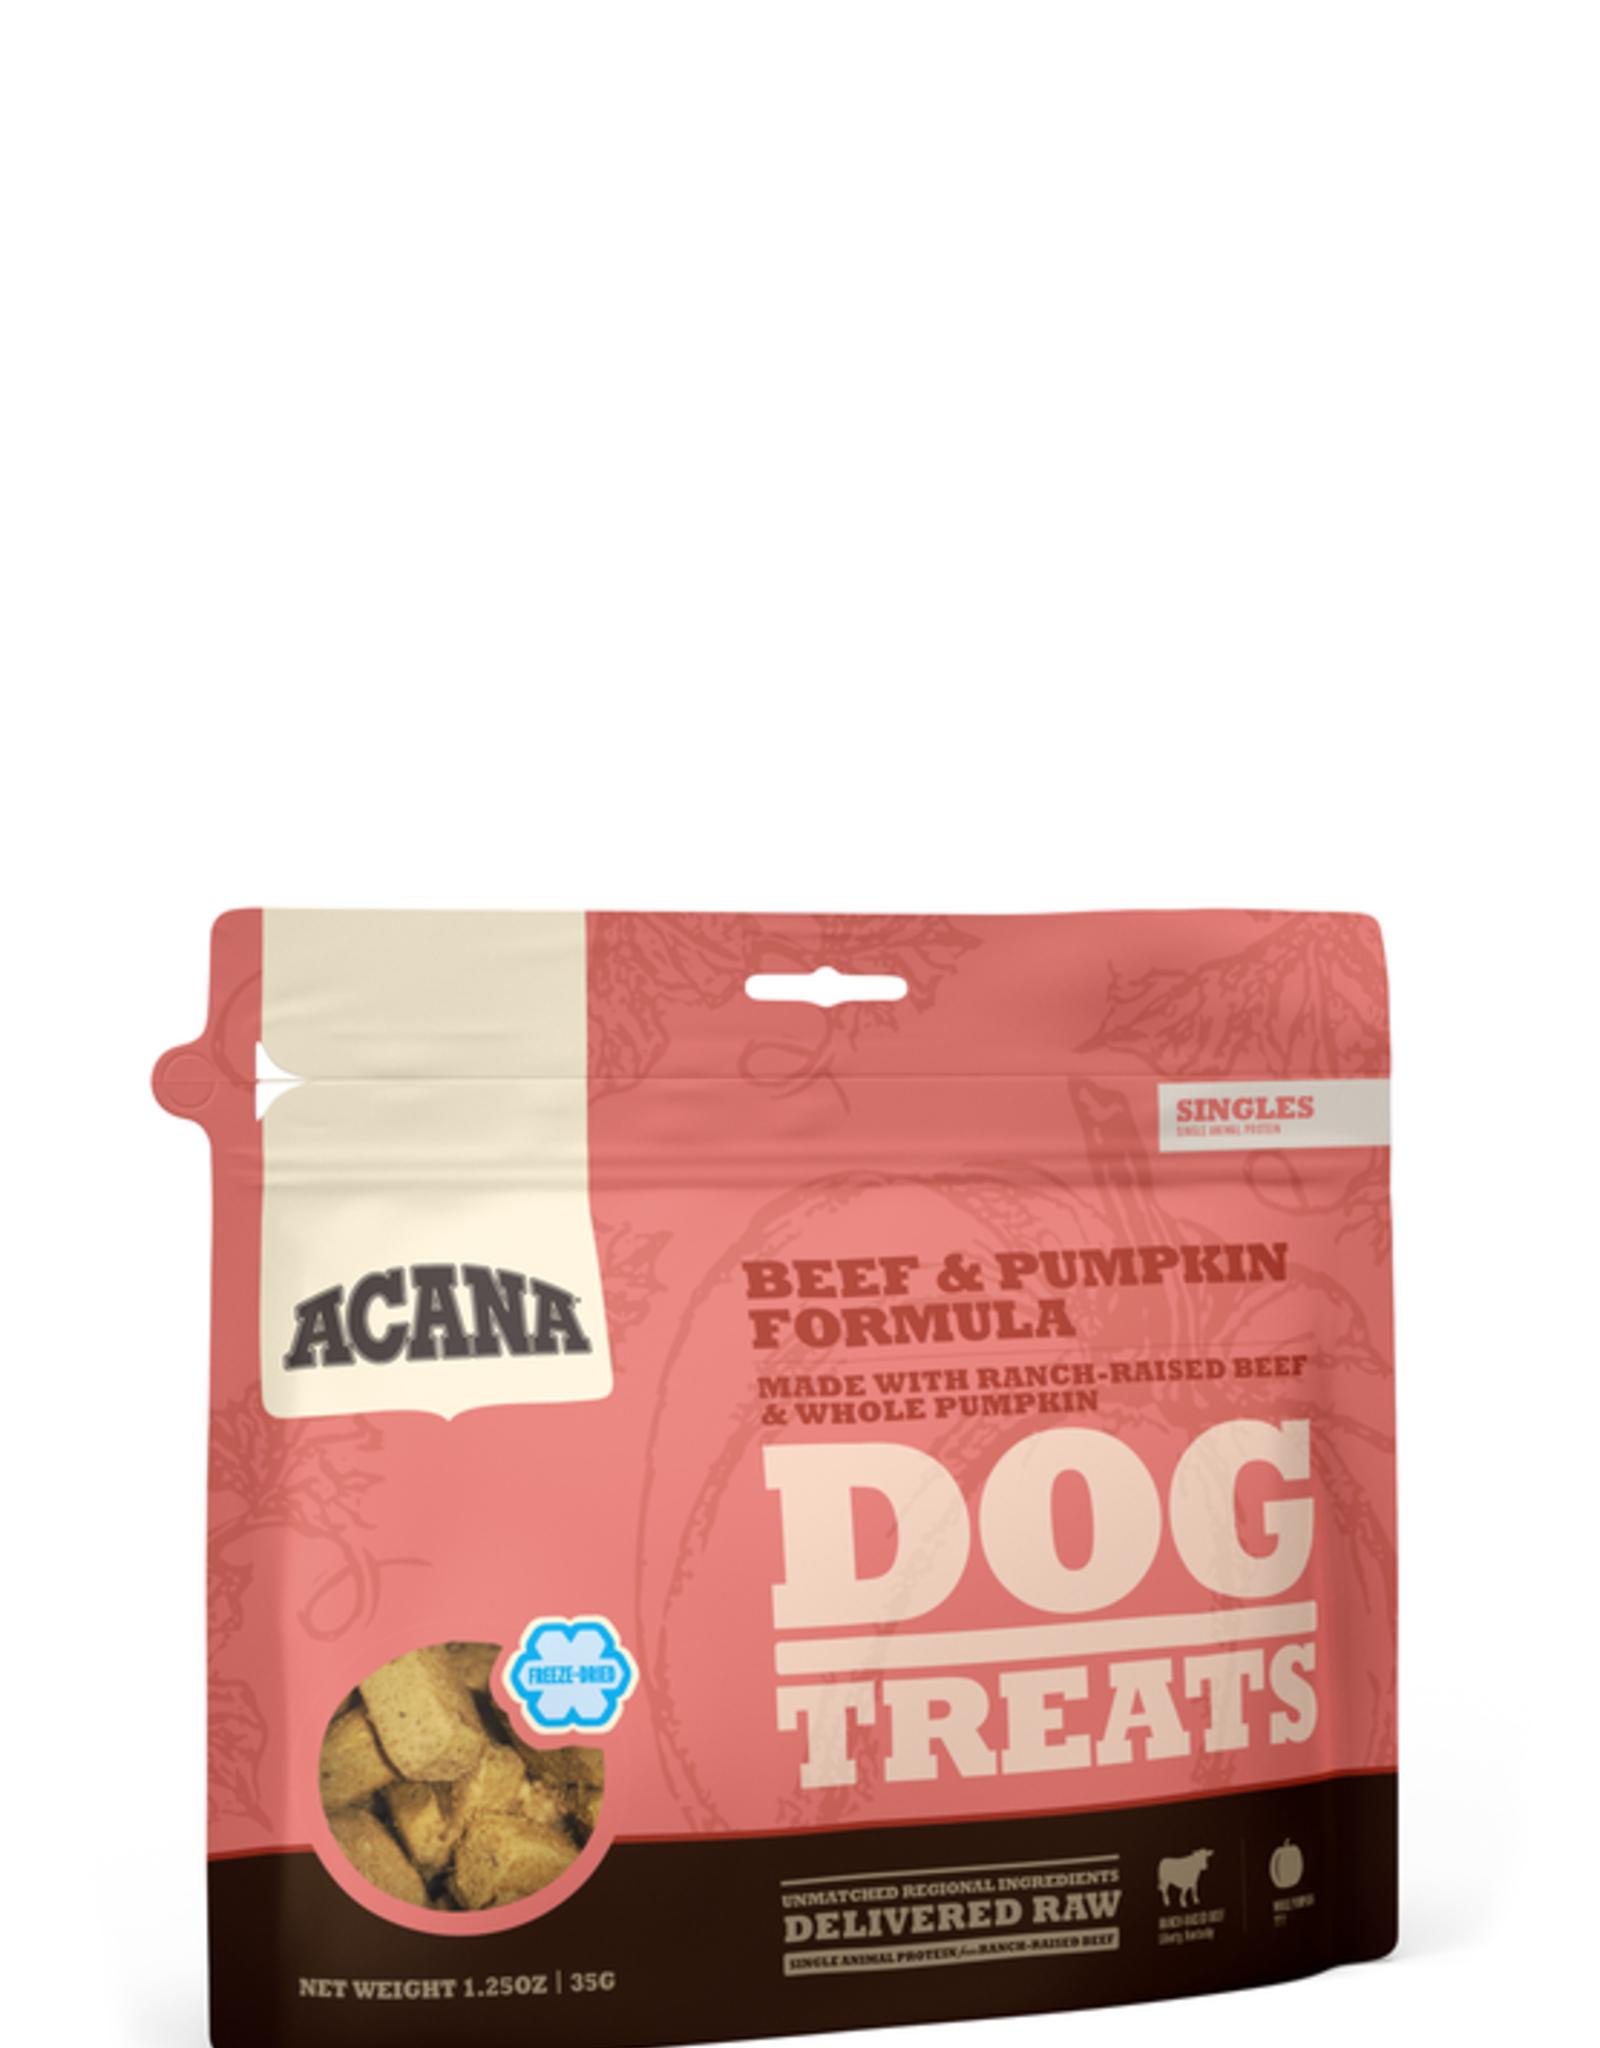 CHAMPION PET FOOD ACANA BEEF & PUMPKIN TREAT 1.5OZ